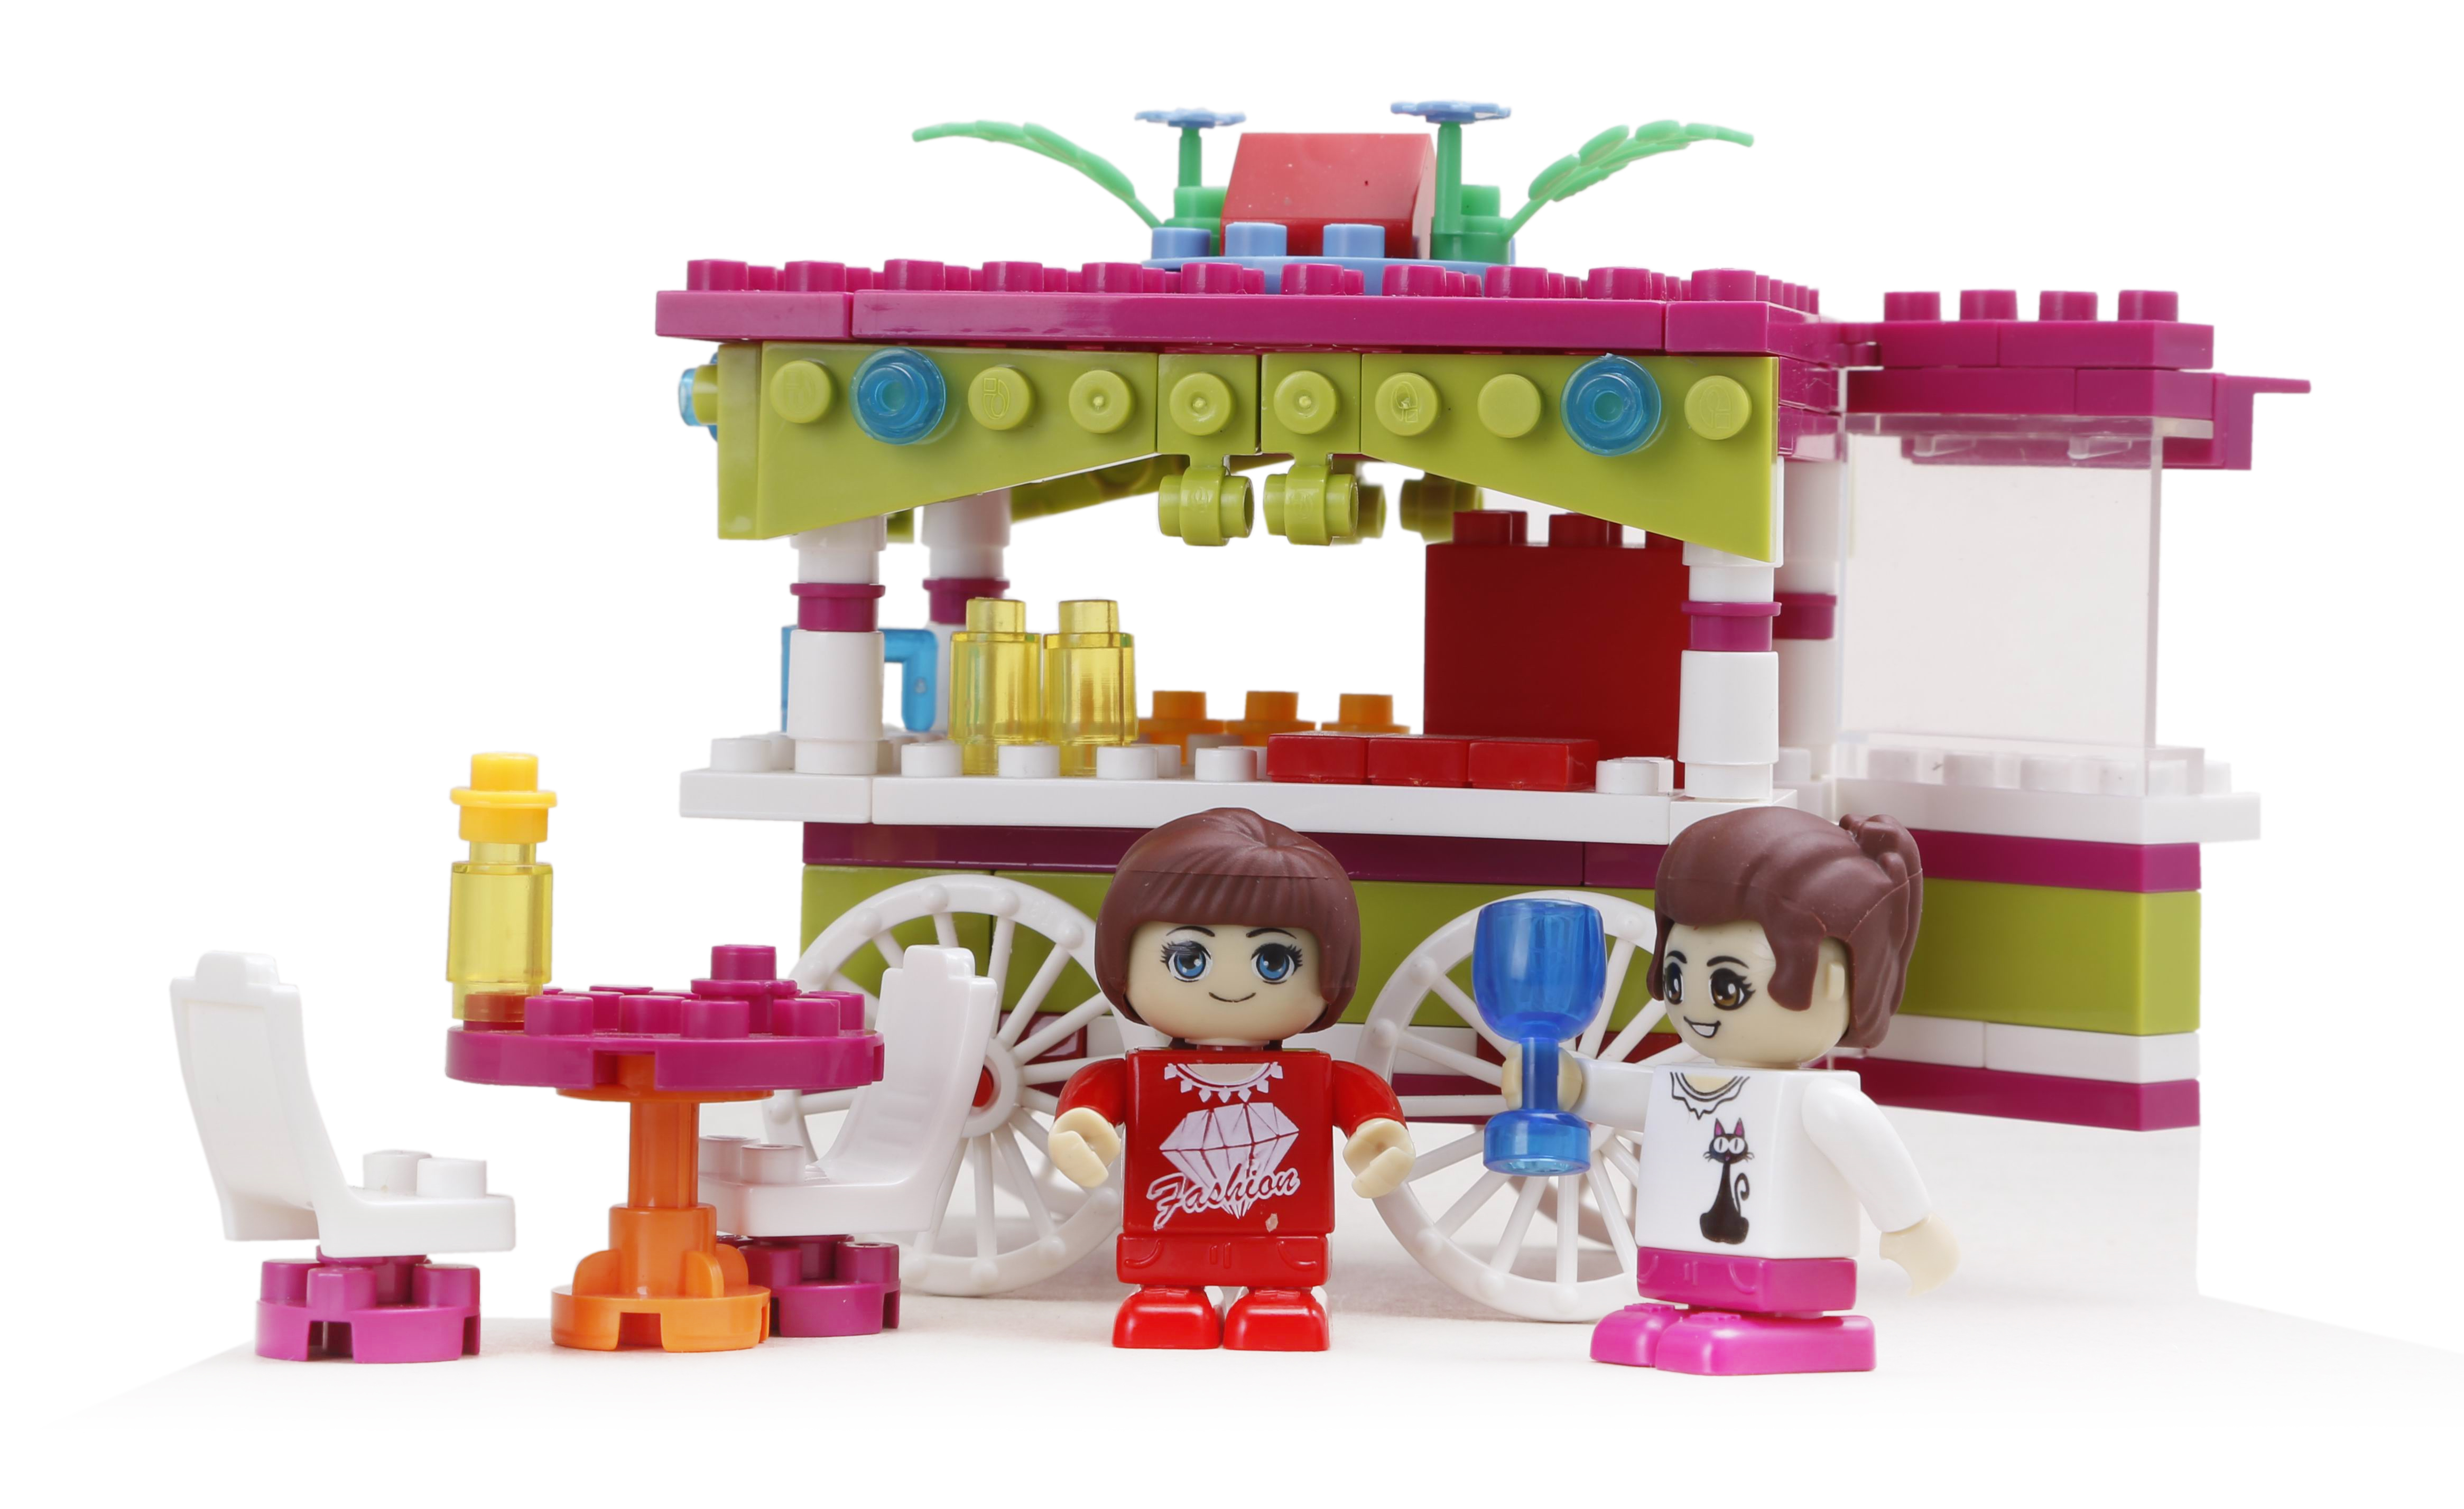 Конструктор Banbao Кафе на колесах конструктор banbao летний дом с 5 фигурками 425 детали 6105